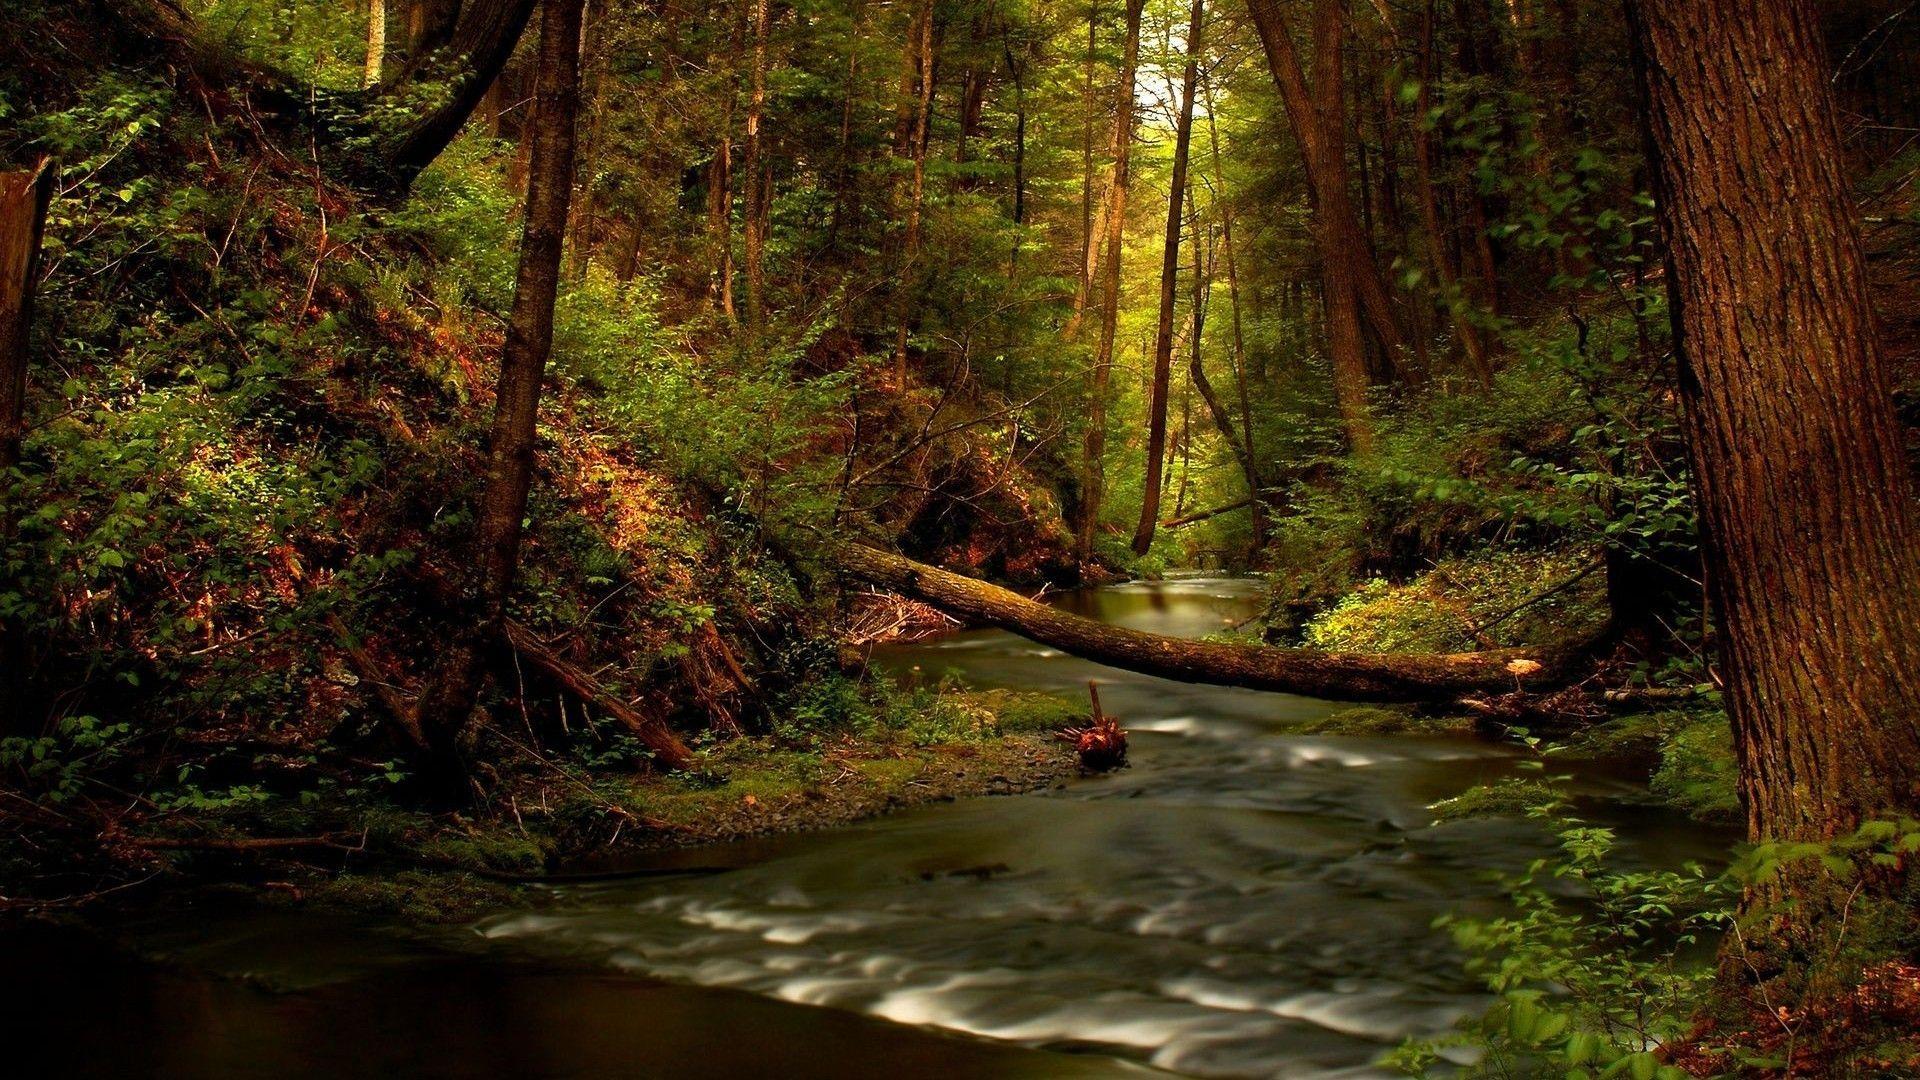 Forest River Wallpaper Hd